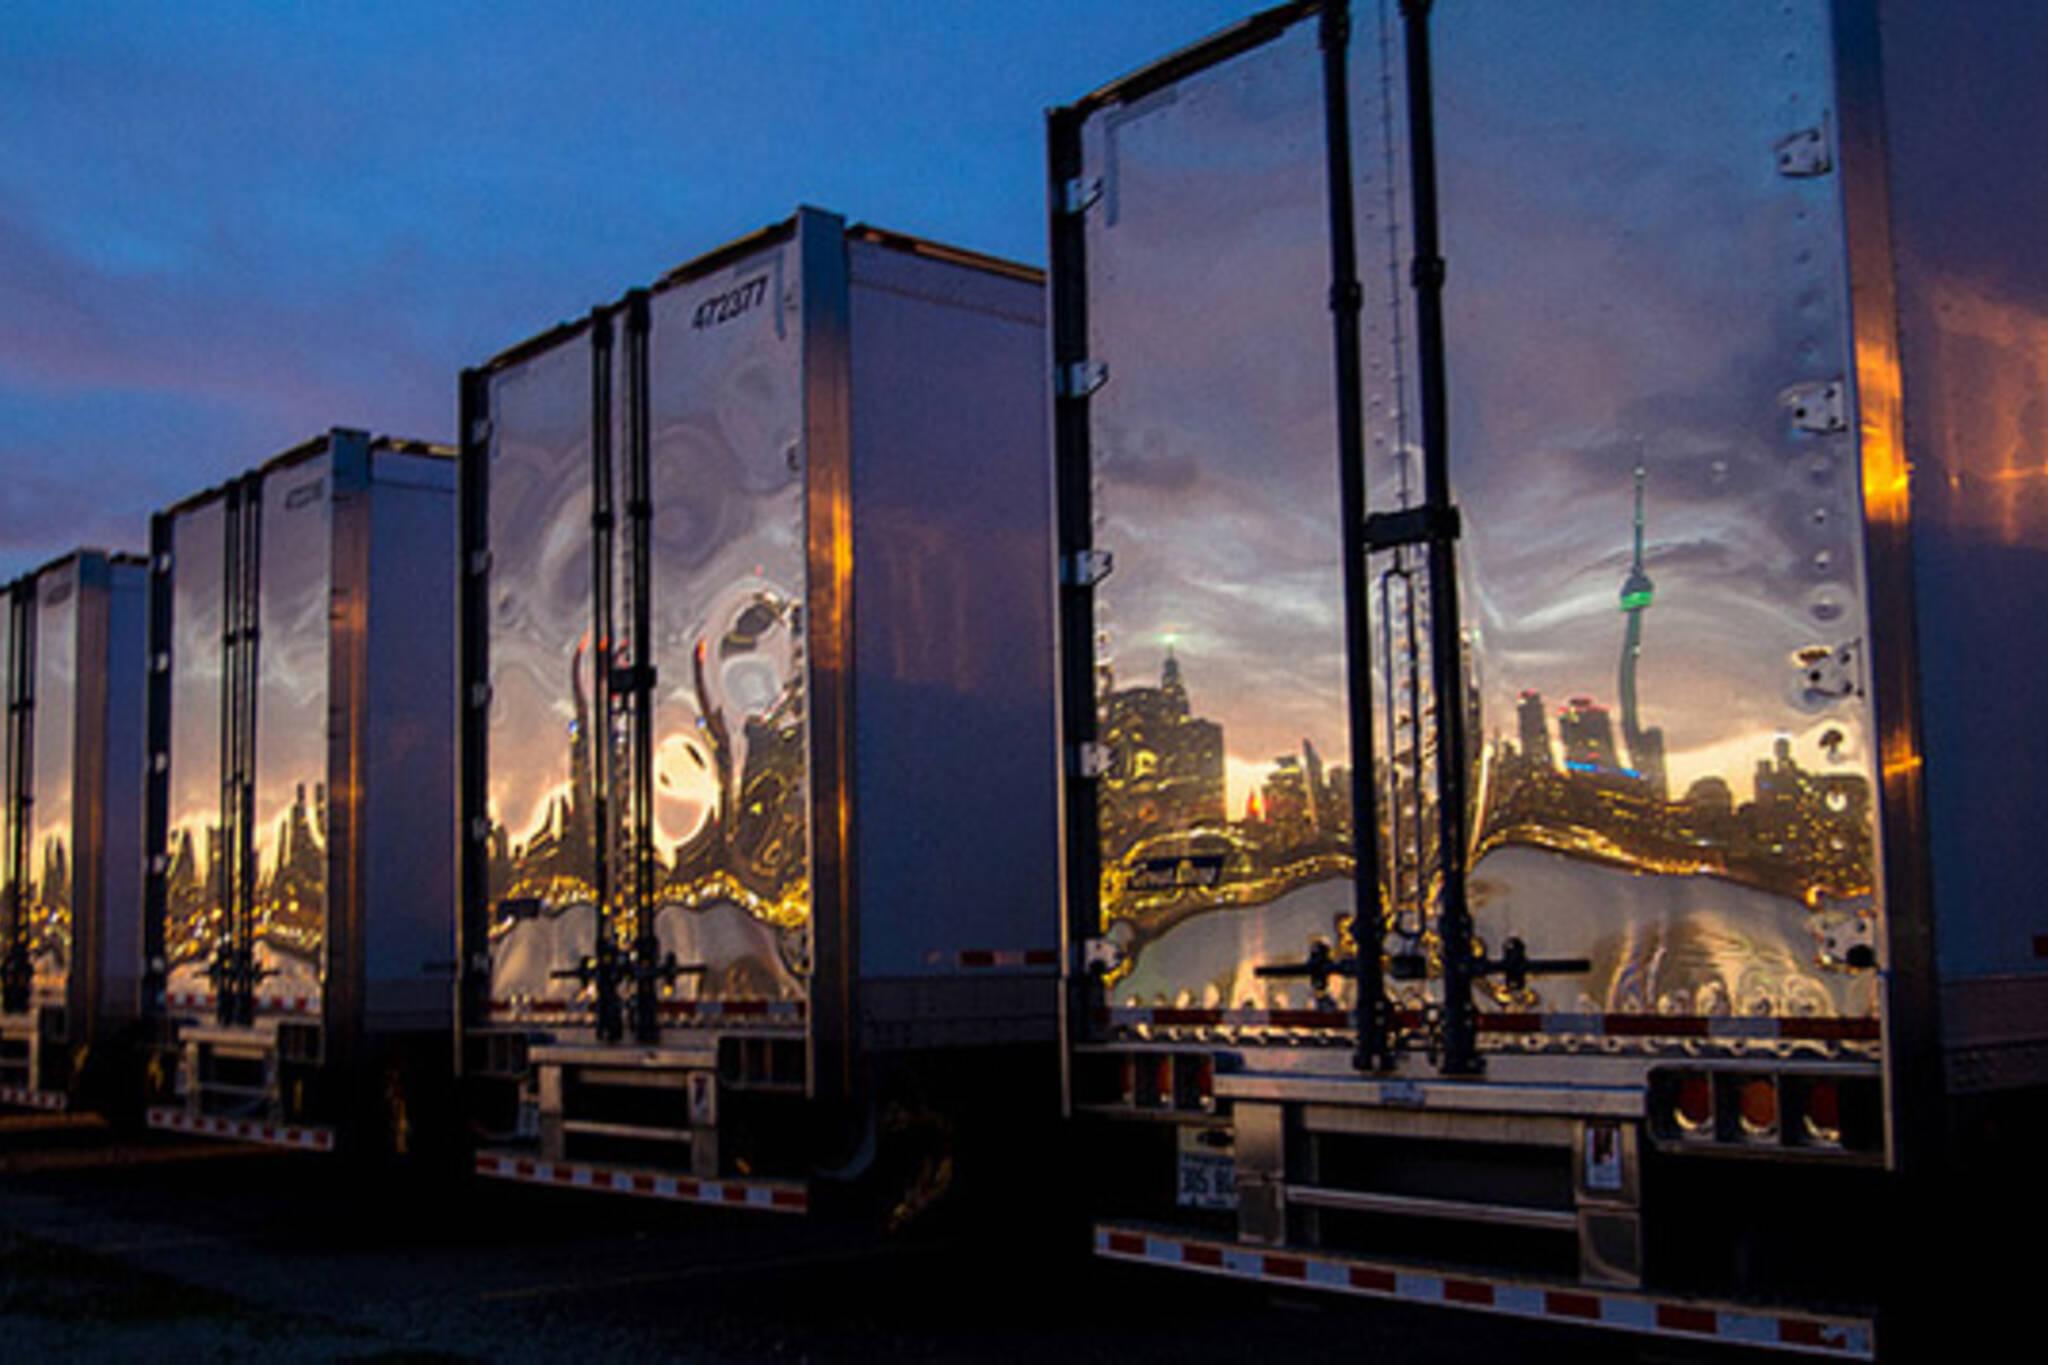 skyline, reflection, trucks